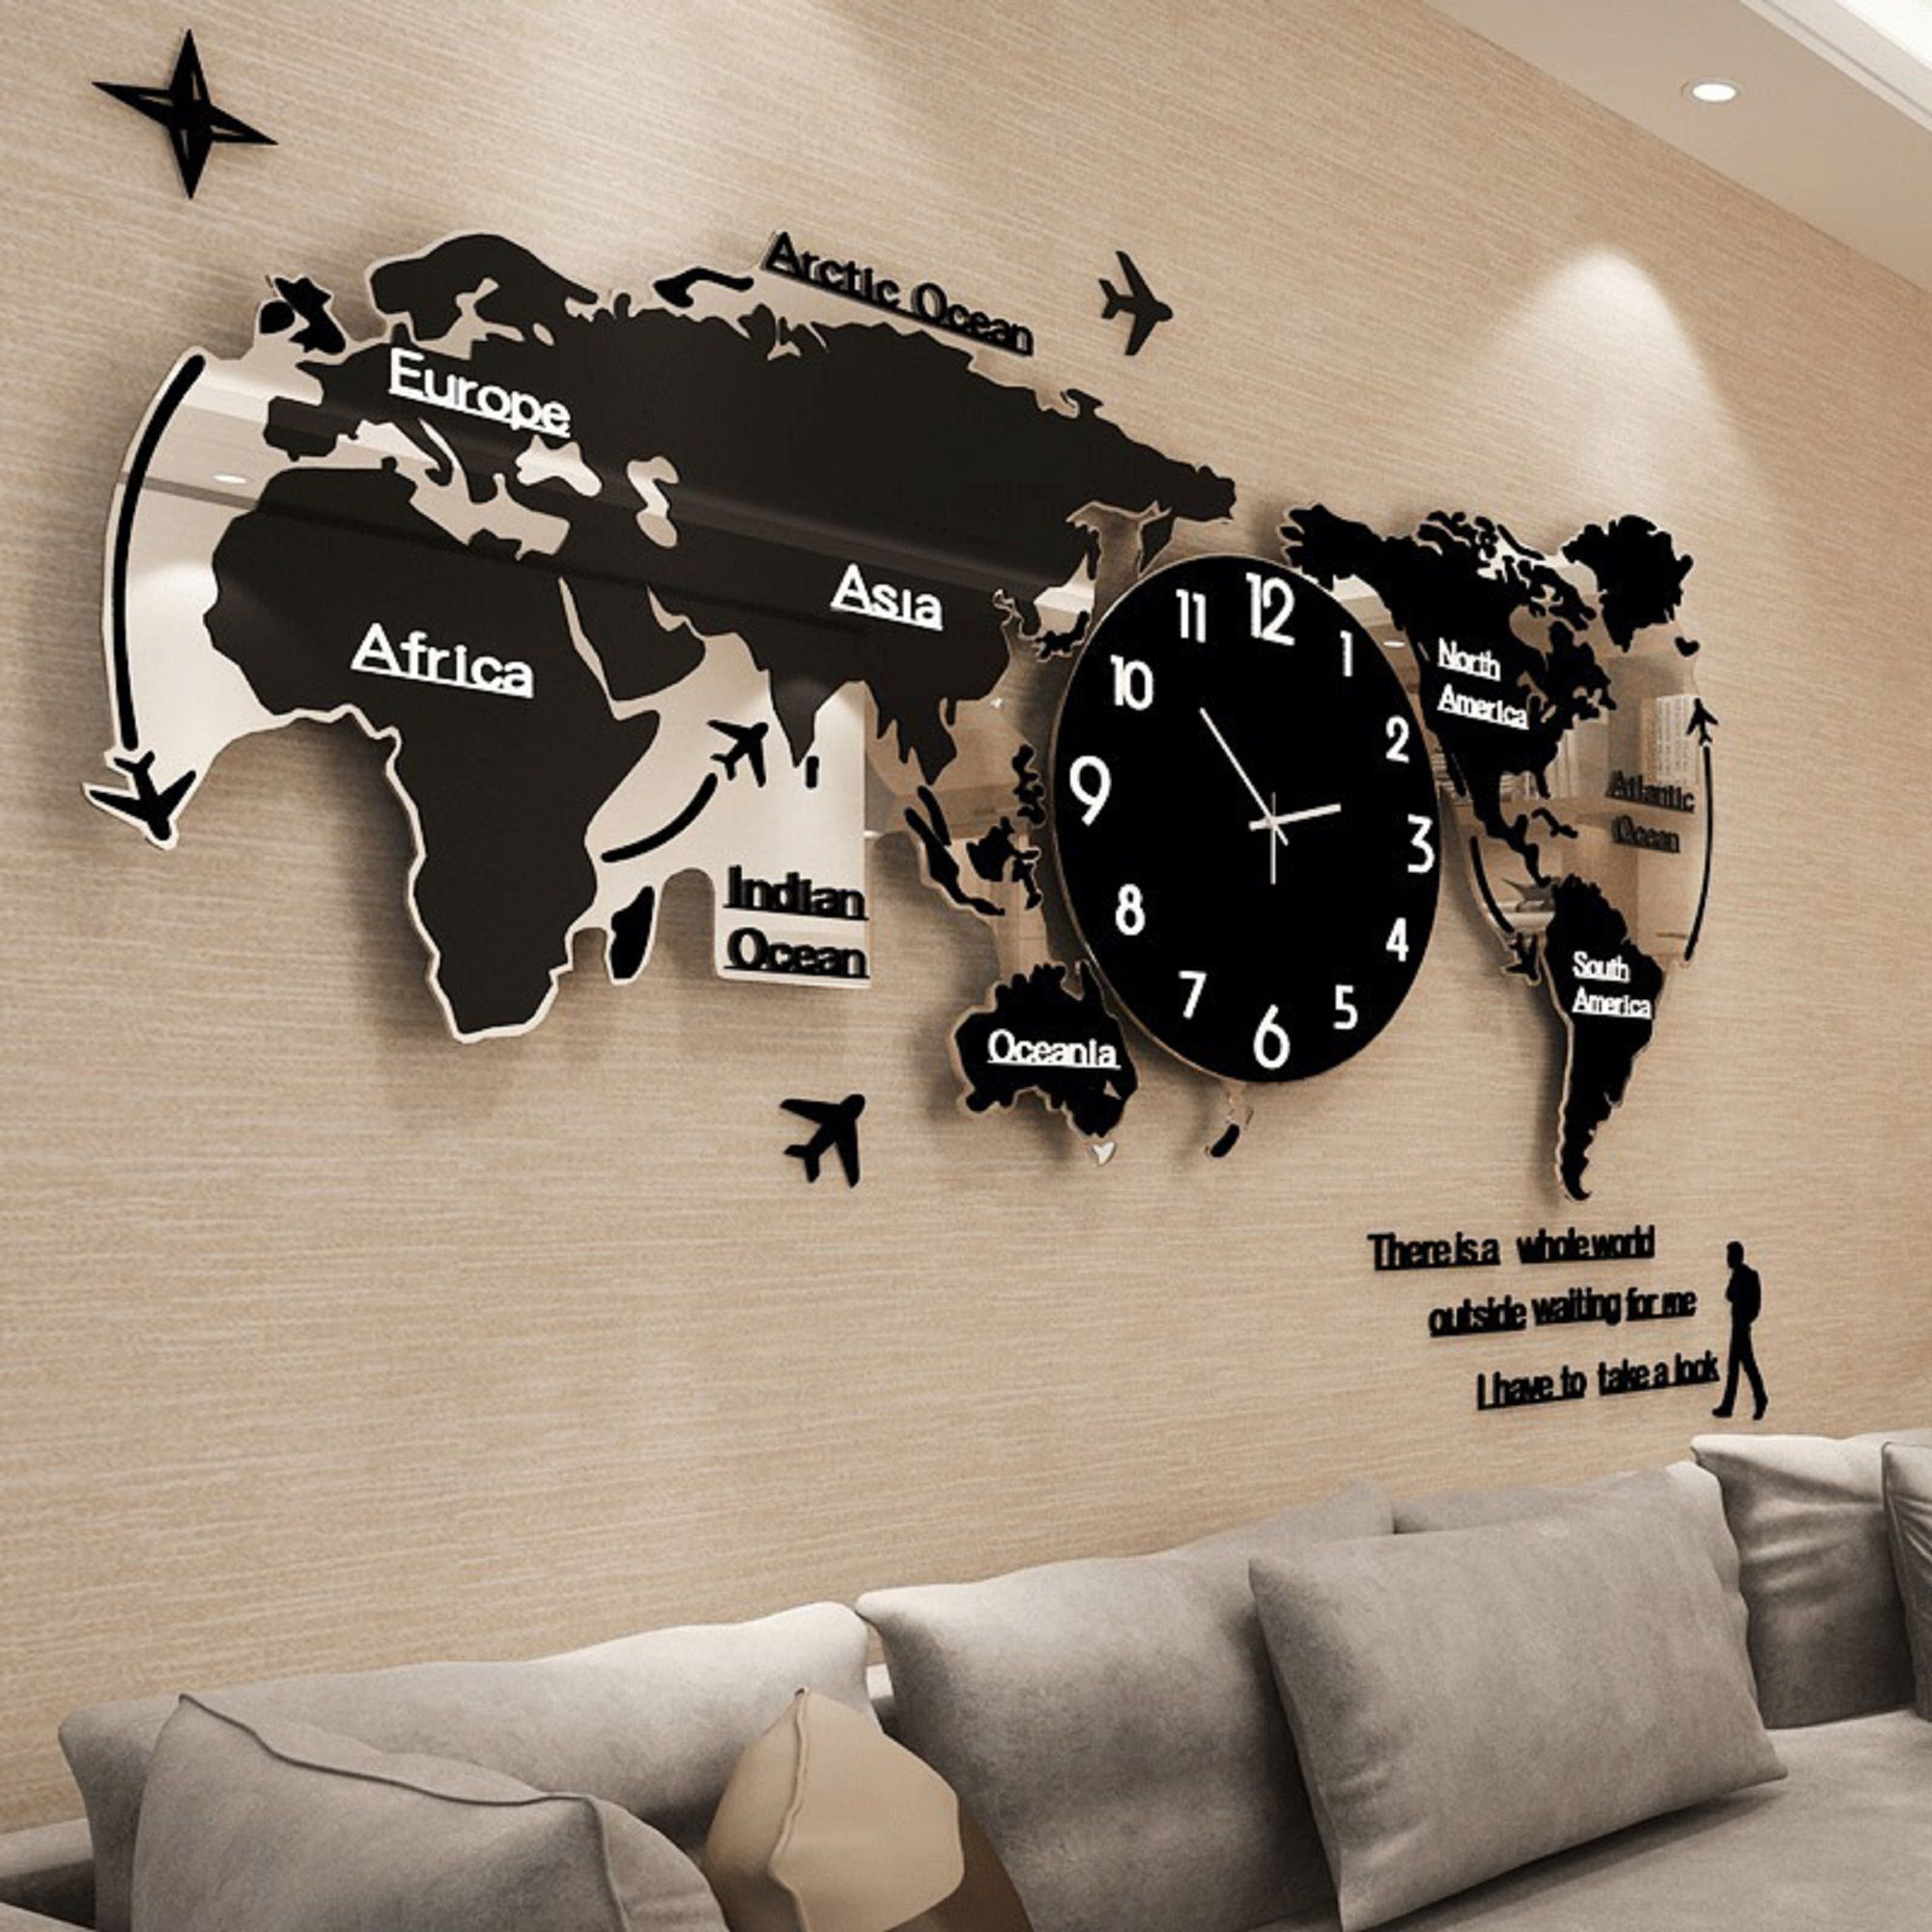 Acrylic Wall Clock Creative World Map Wall Etsy In 2021 World Map Wall Wall Watch Clock